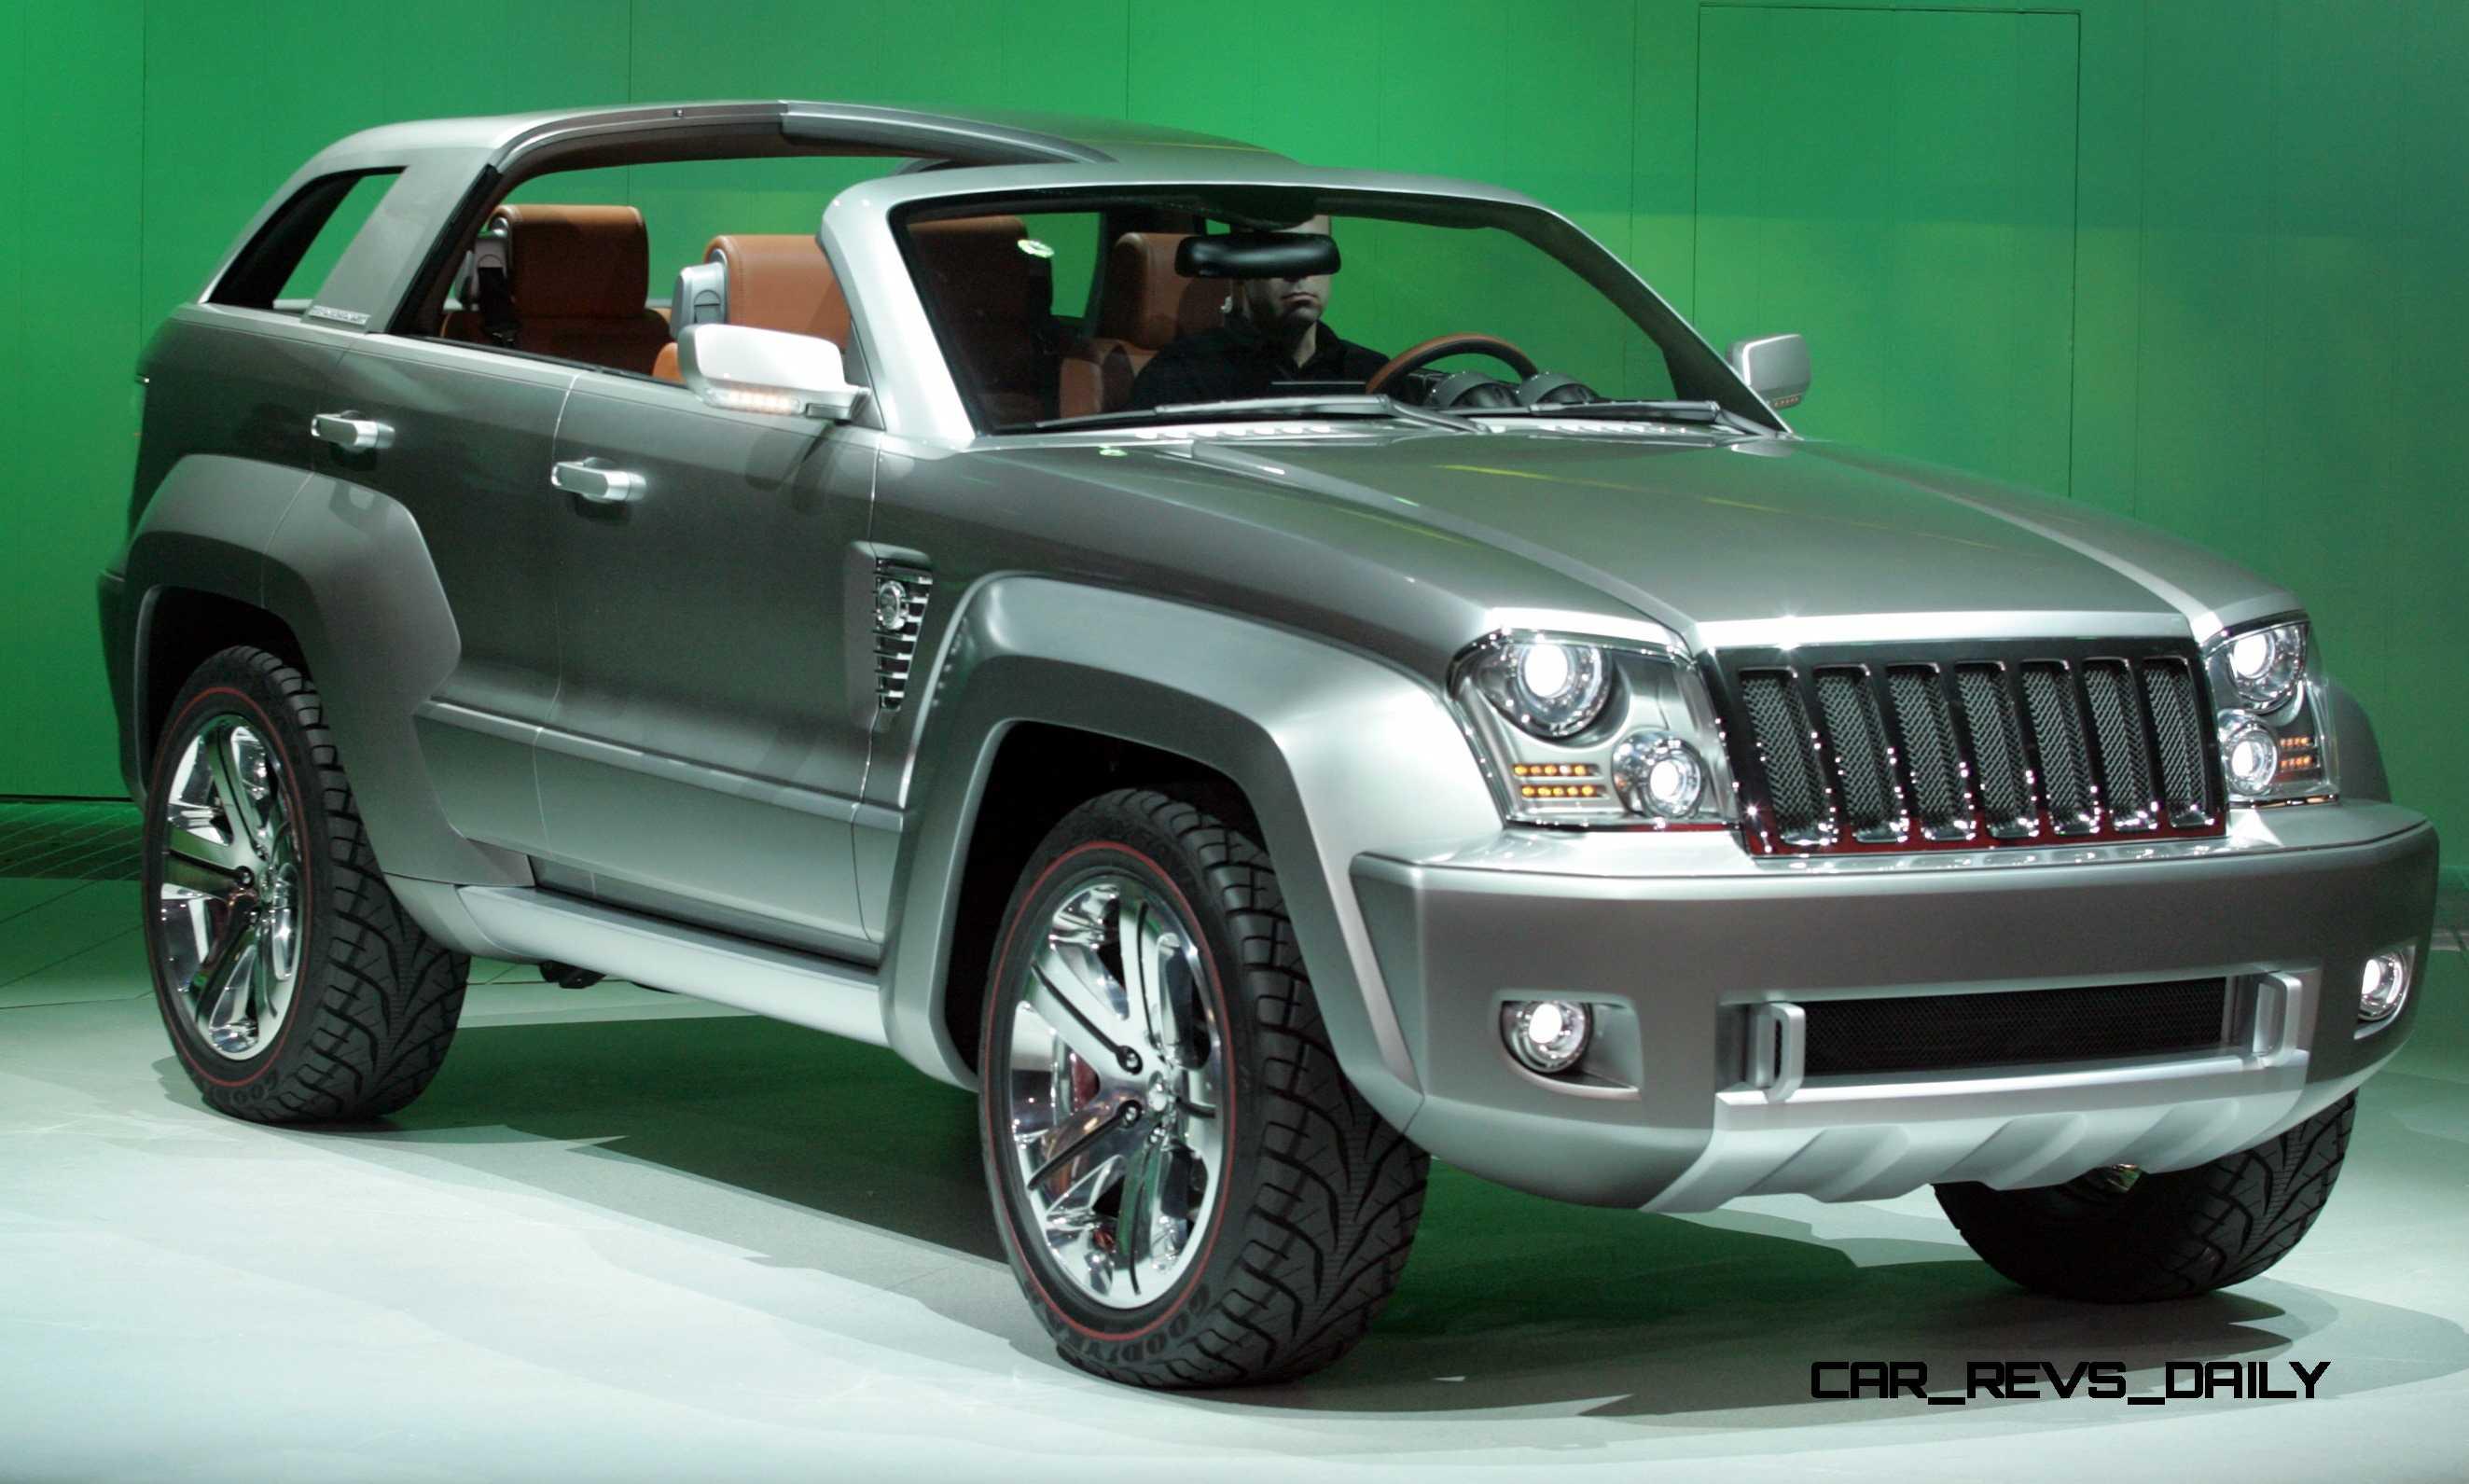 2007 Jeep Trailhawk 25 Car Revs Daily